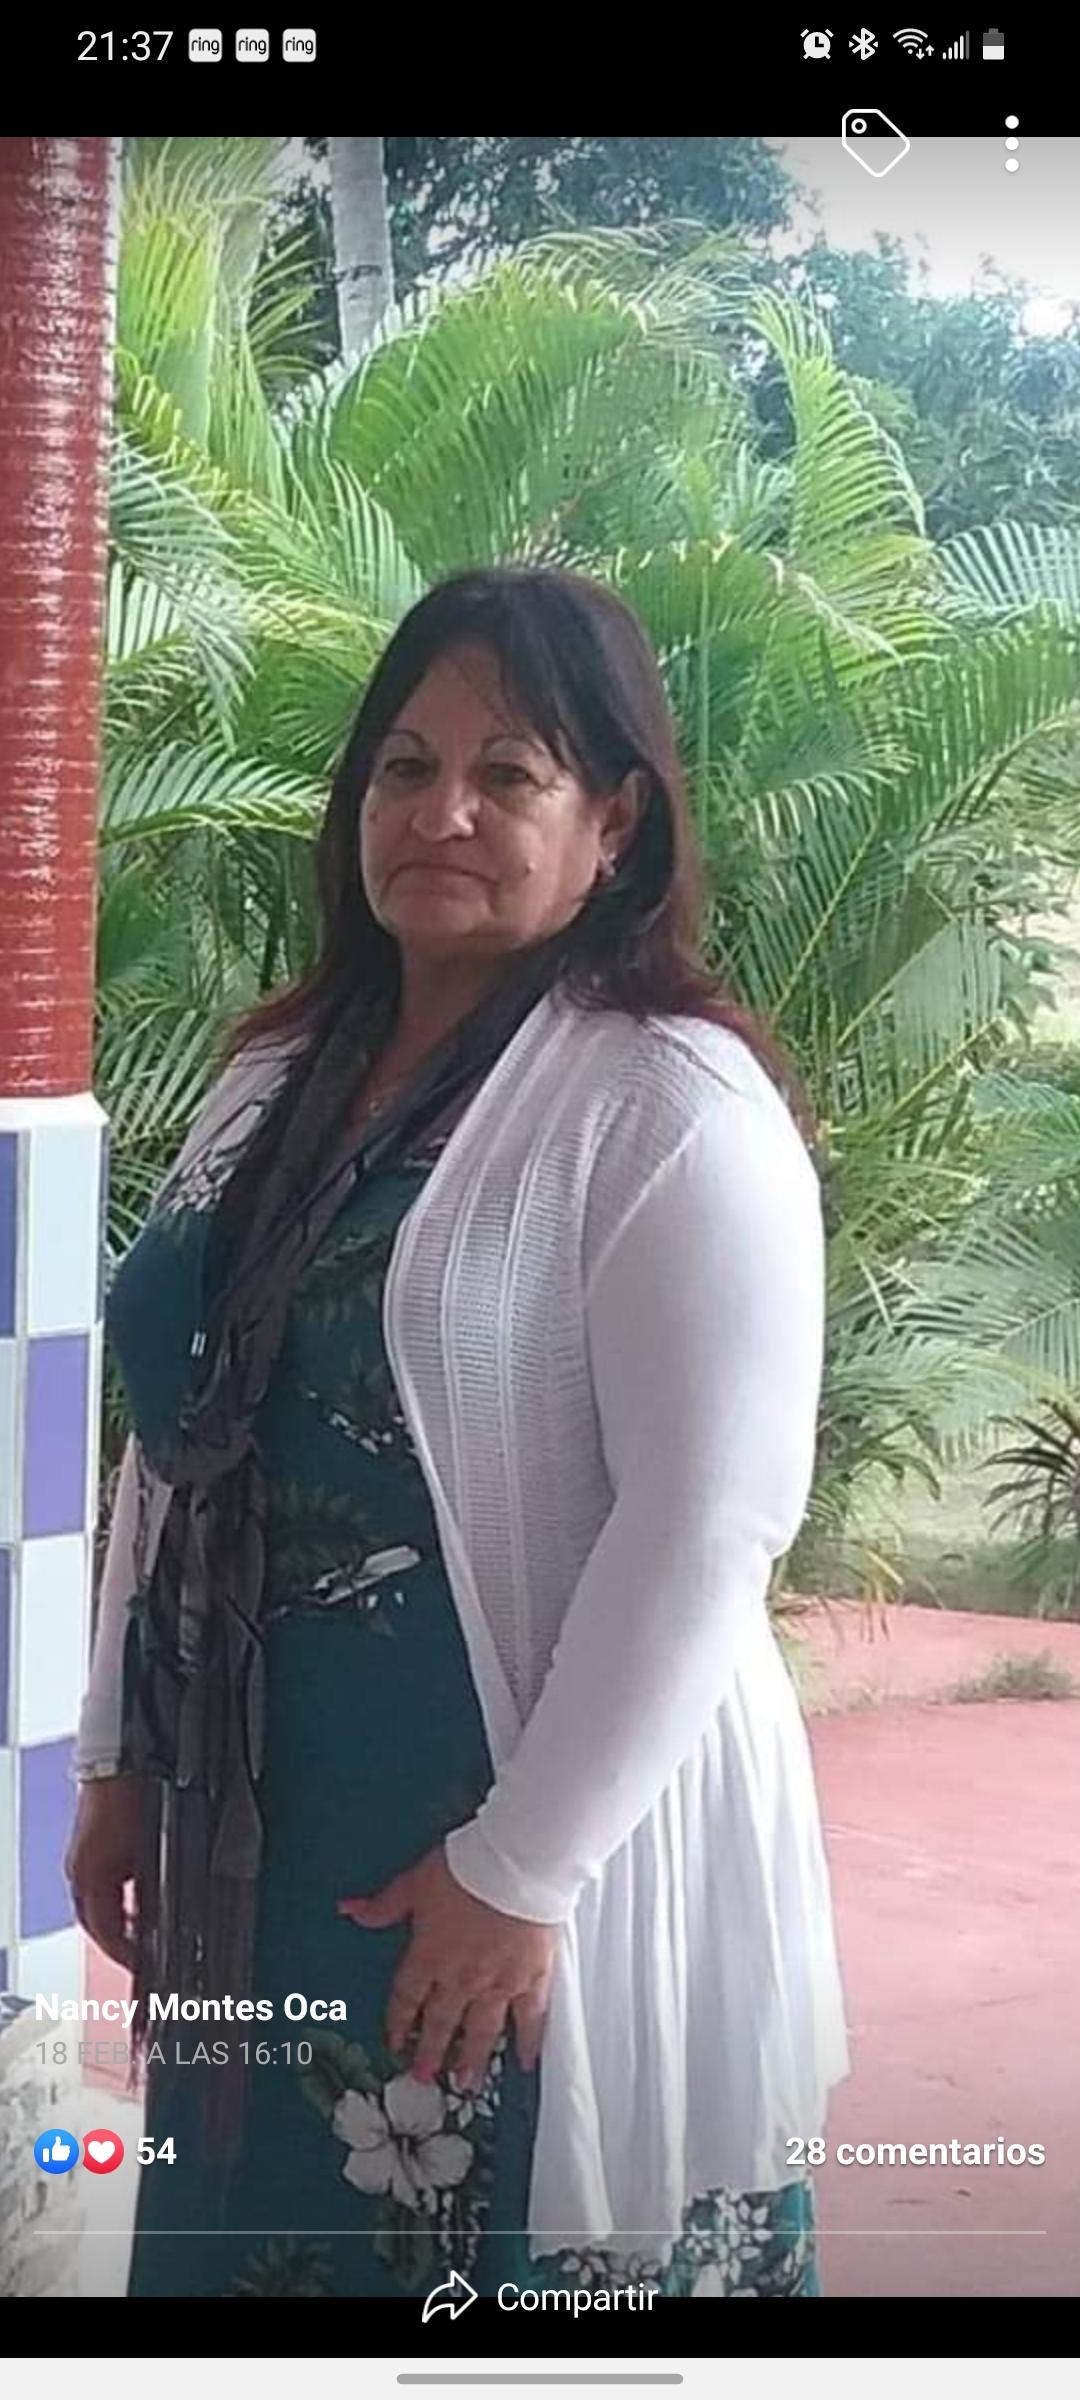 Nancy Montes de Oca